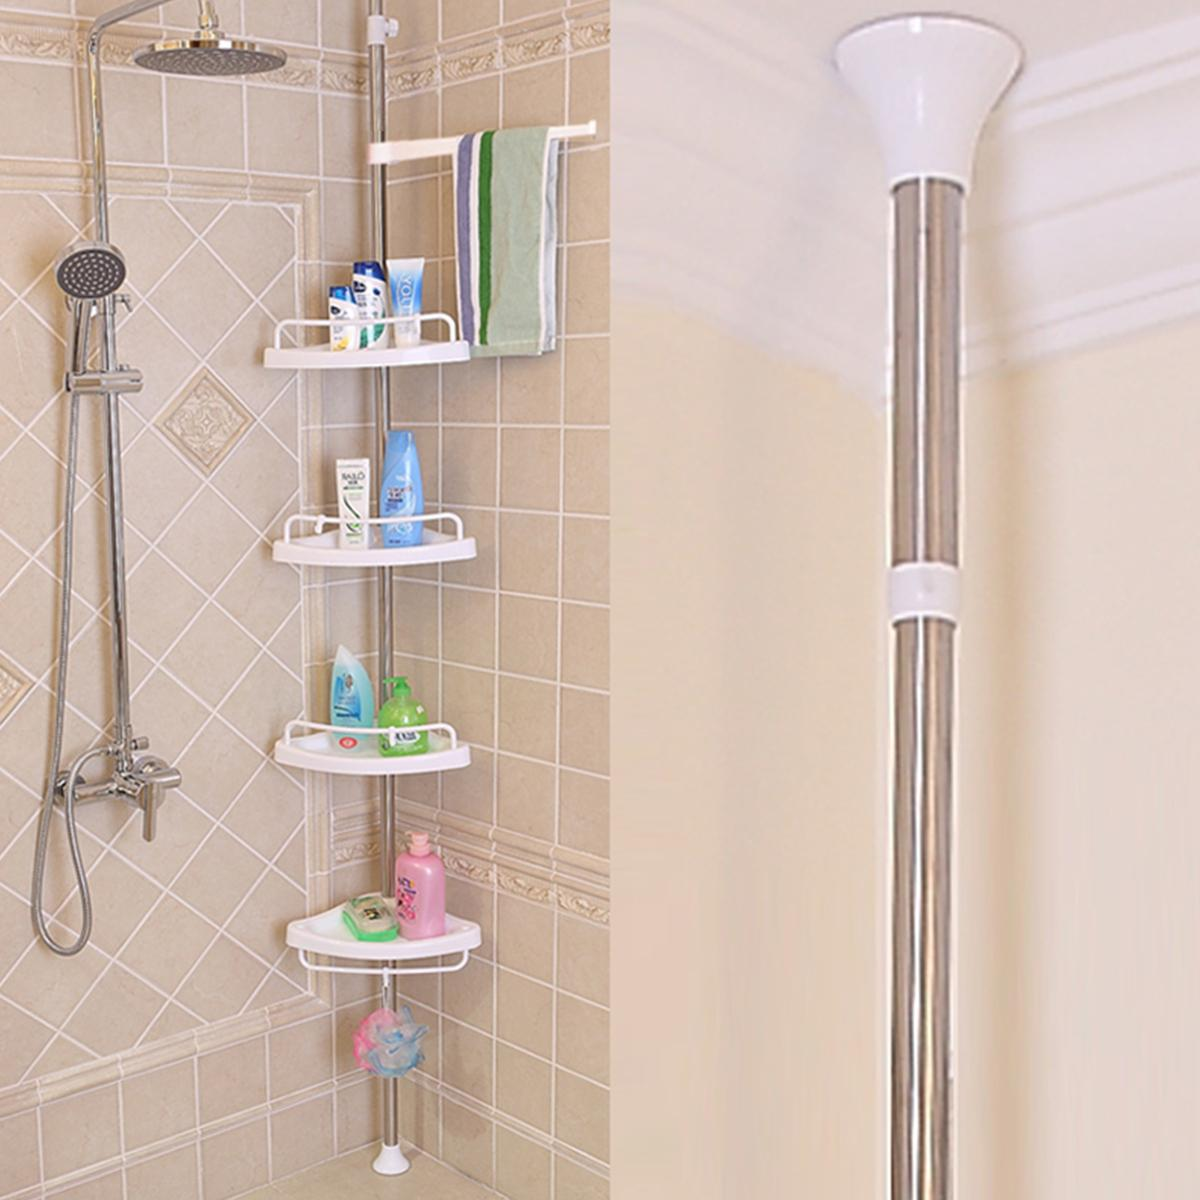 Bathroom Shelf Punch Free 4, Corner Shelves Bathroom Shower